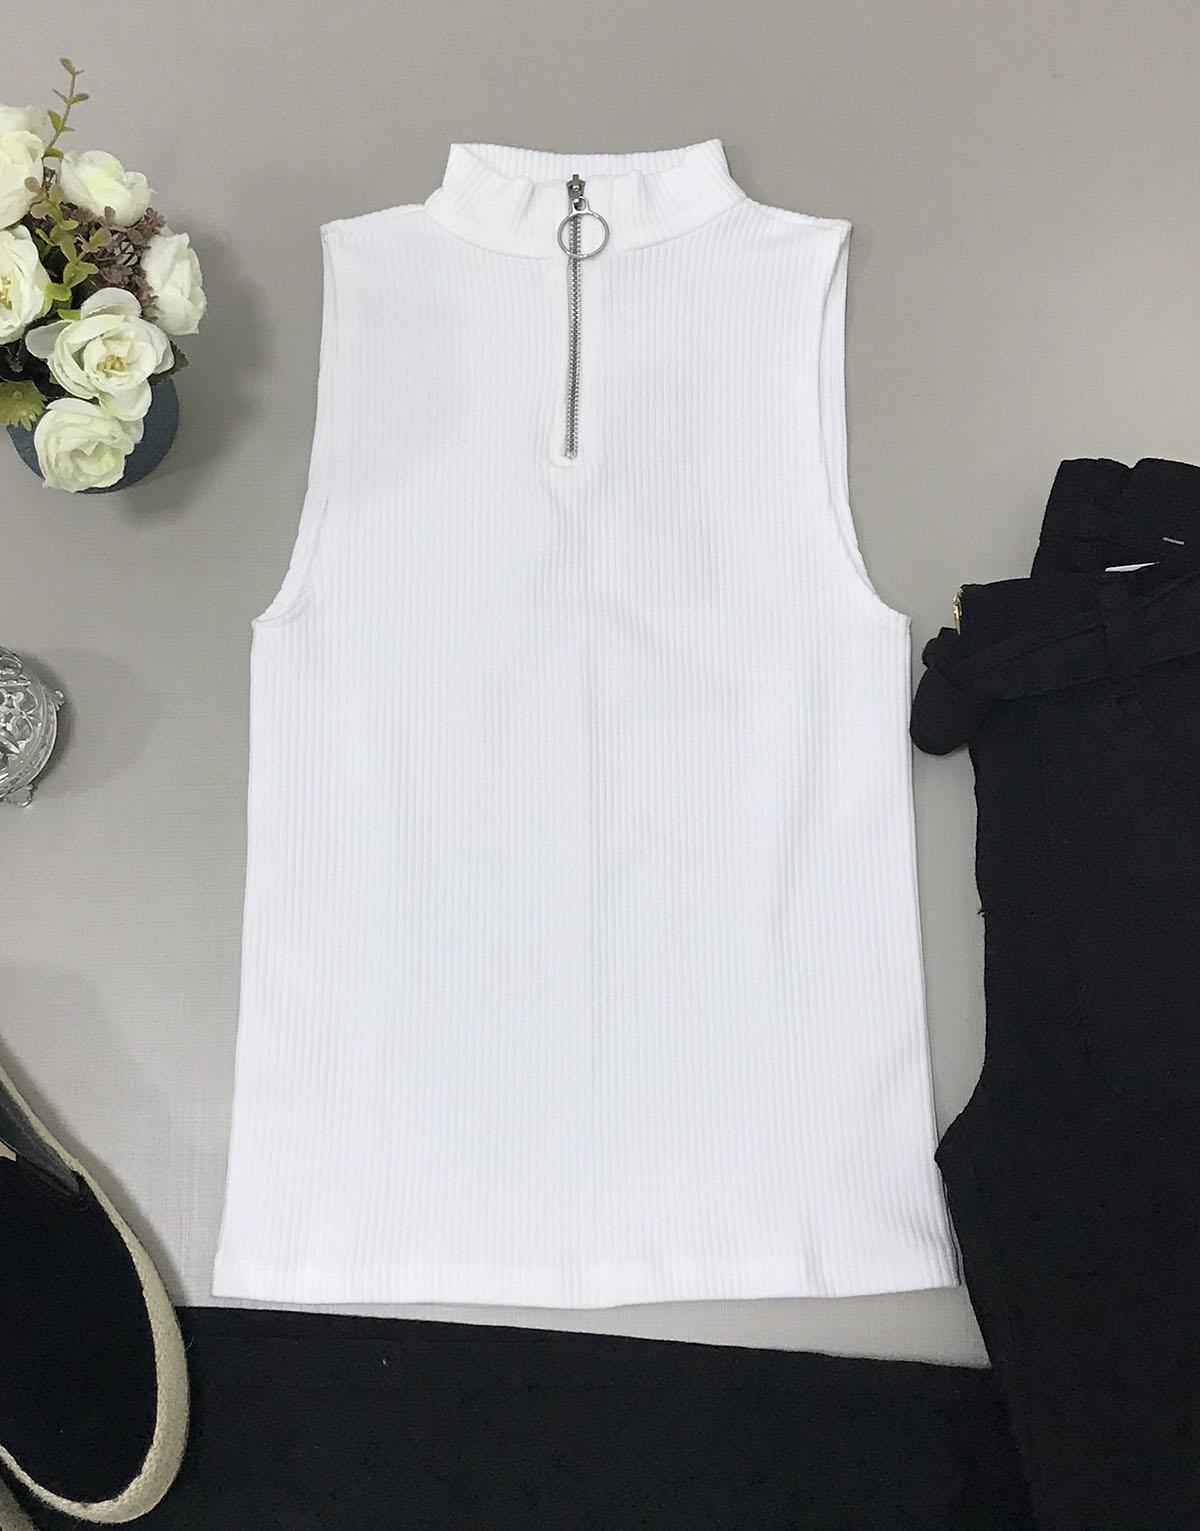 dbc7c2680d Blusa Canelada Zíper Off White – Lavinny Store